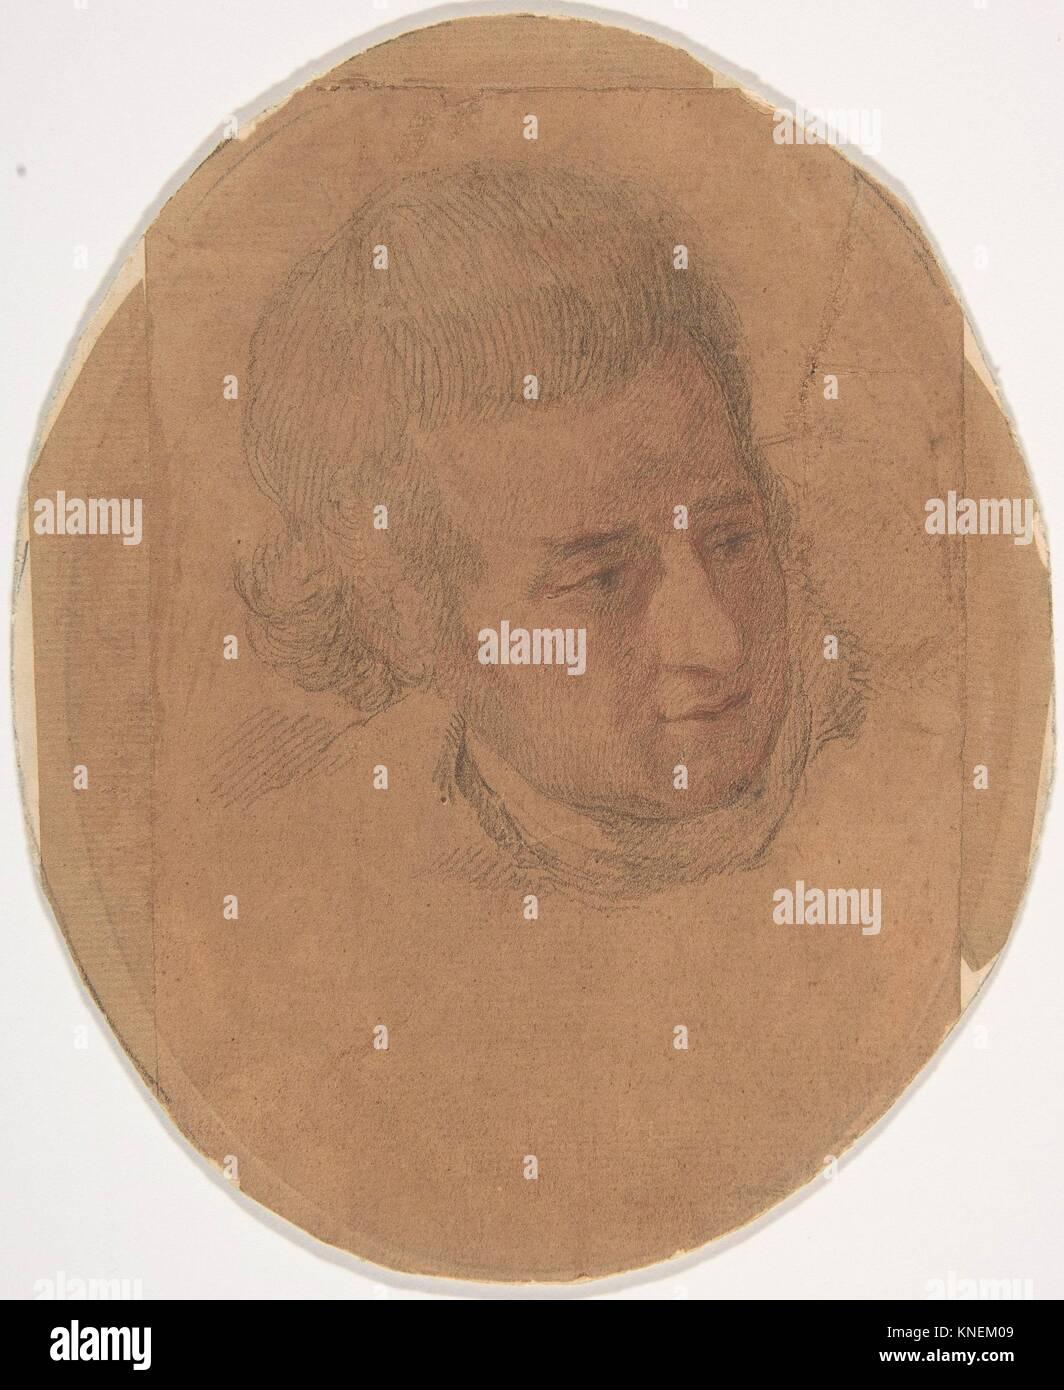 Thomas Howard, 3rd Earl of Effingham and 9th Baron Howard. Artist: Francesco Bartolozzi (Italian, Florence 1728 - Stock Image